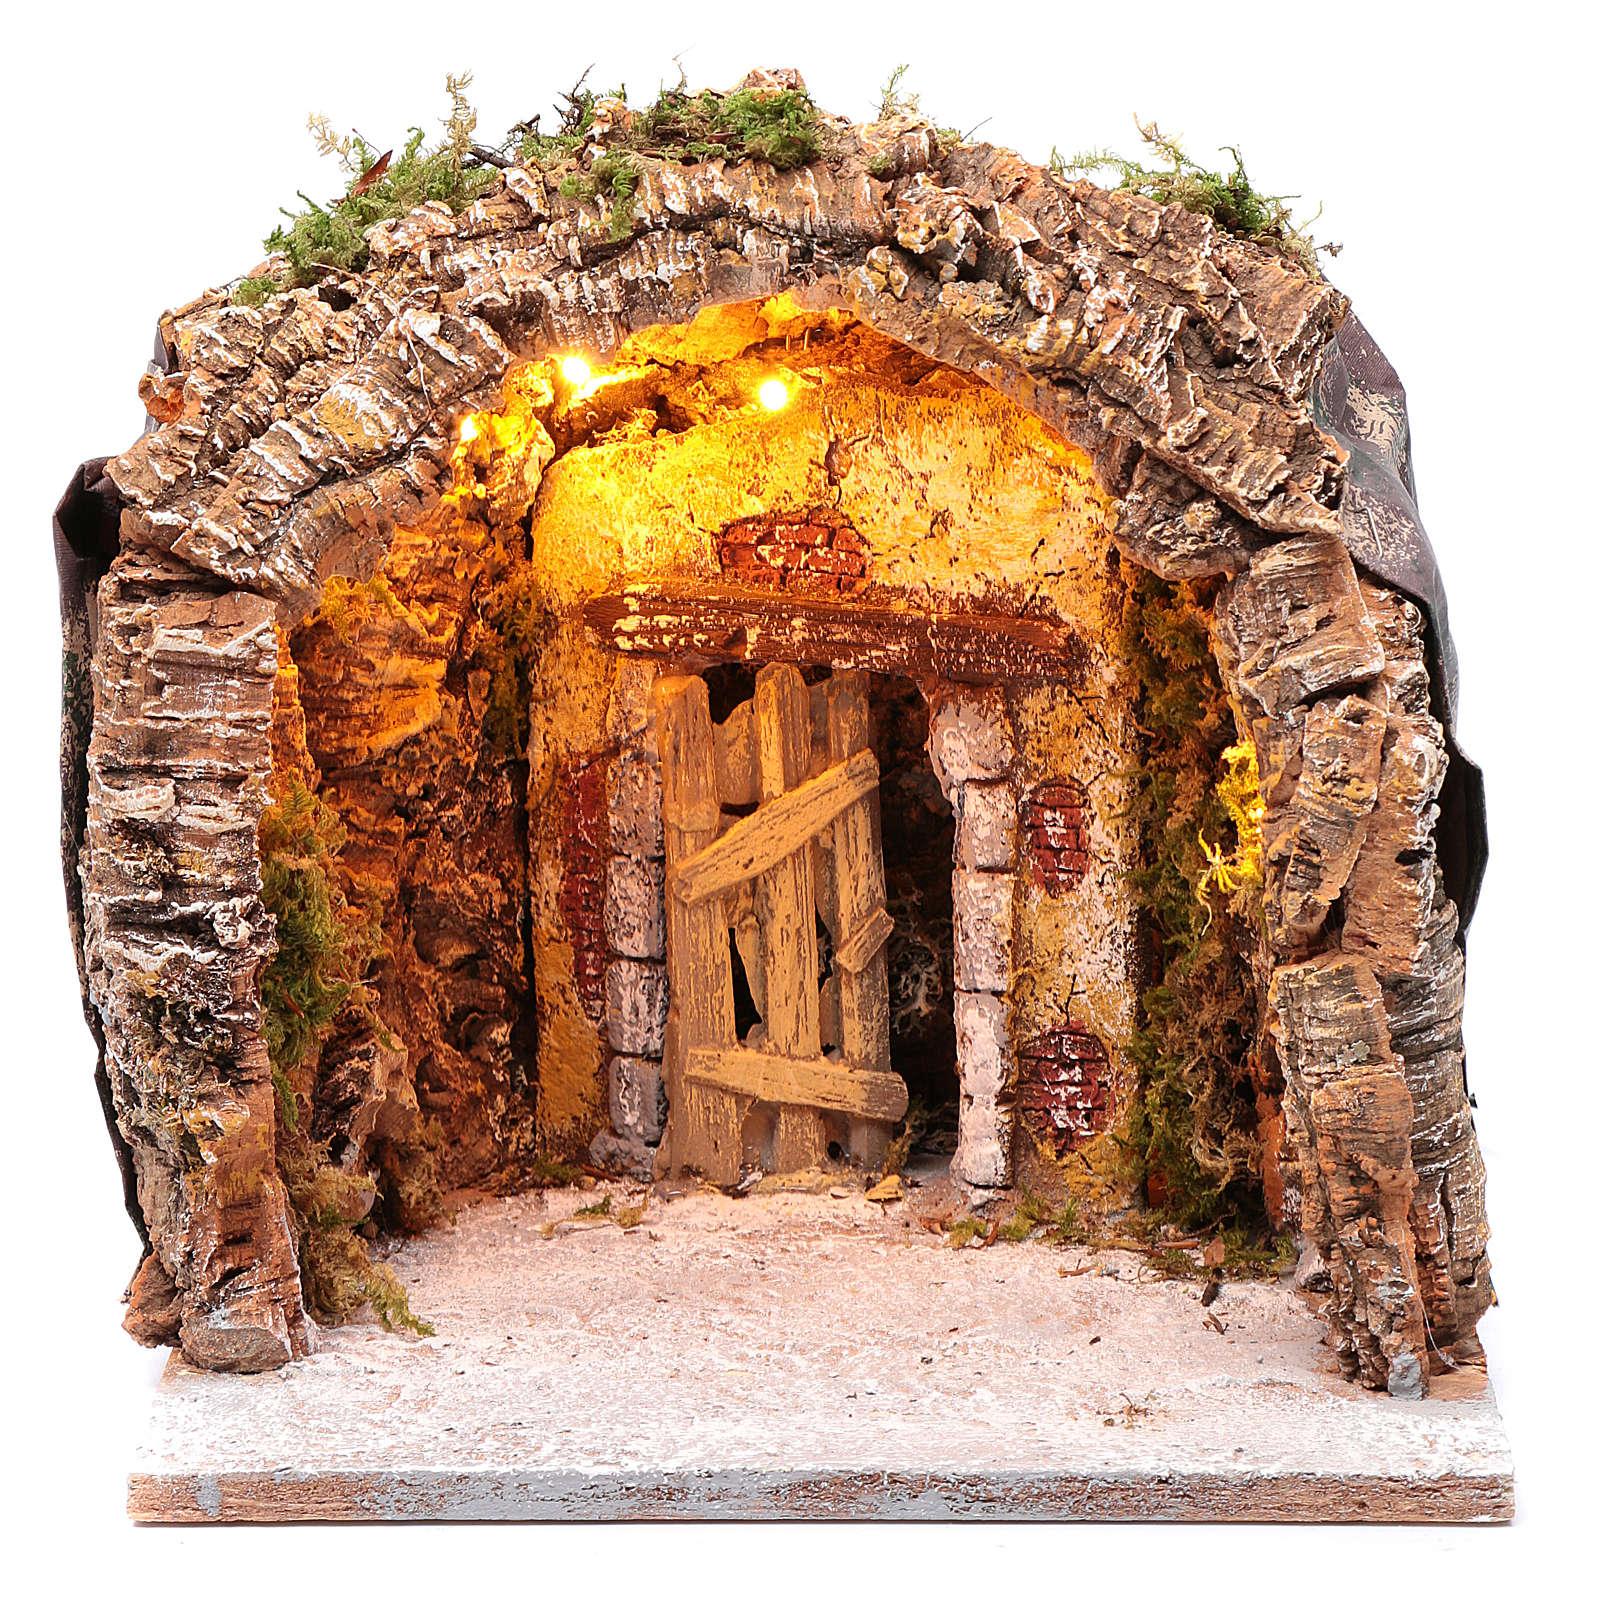 Gruta iluminada belén Nápoles 28x25x26 cm corcho y madera 4